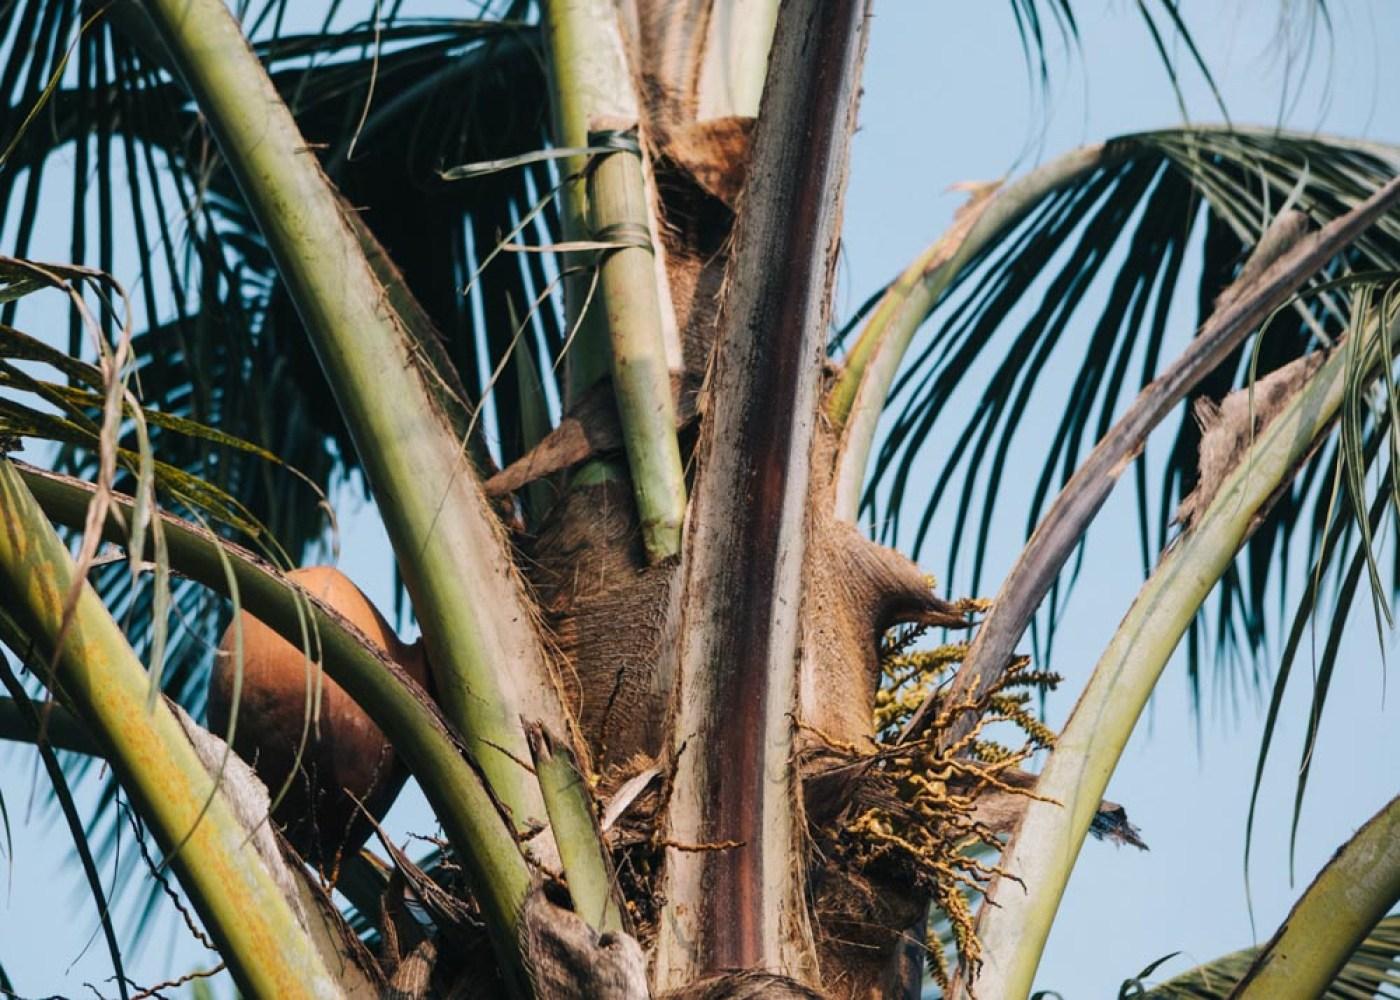 Greenpalms homestay - a special experience in Kerala